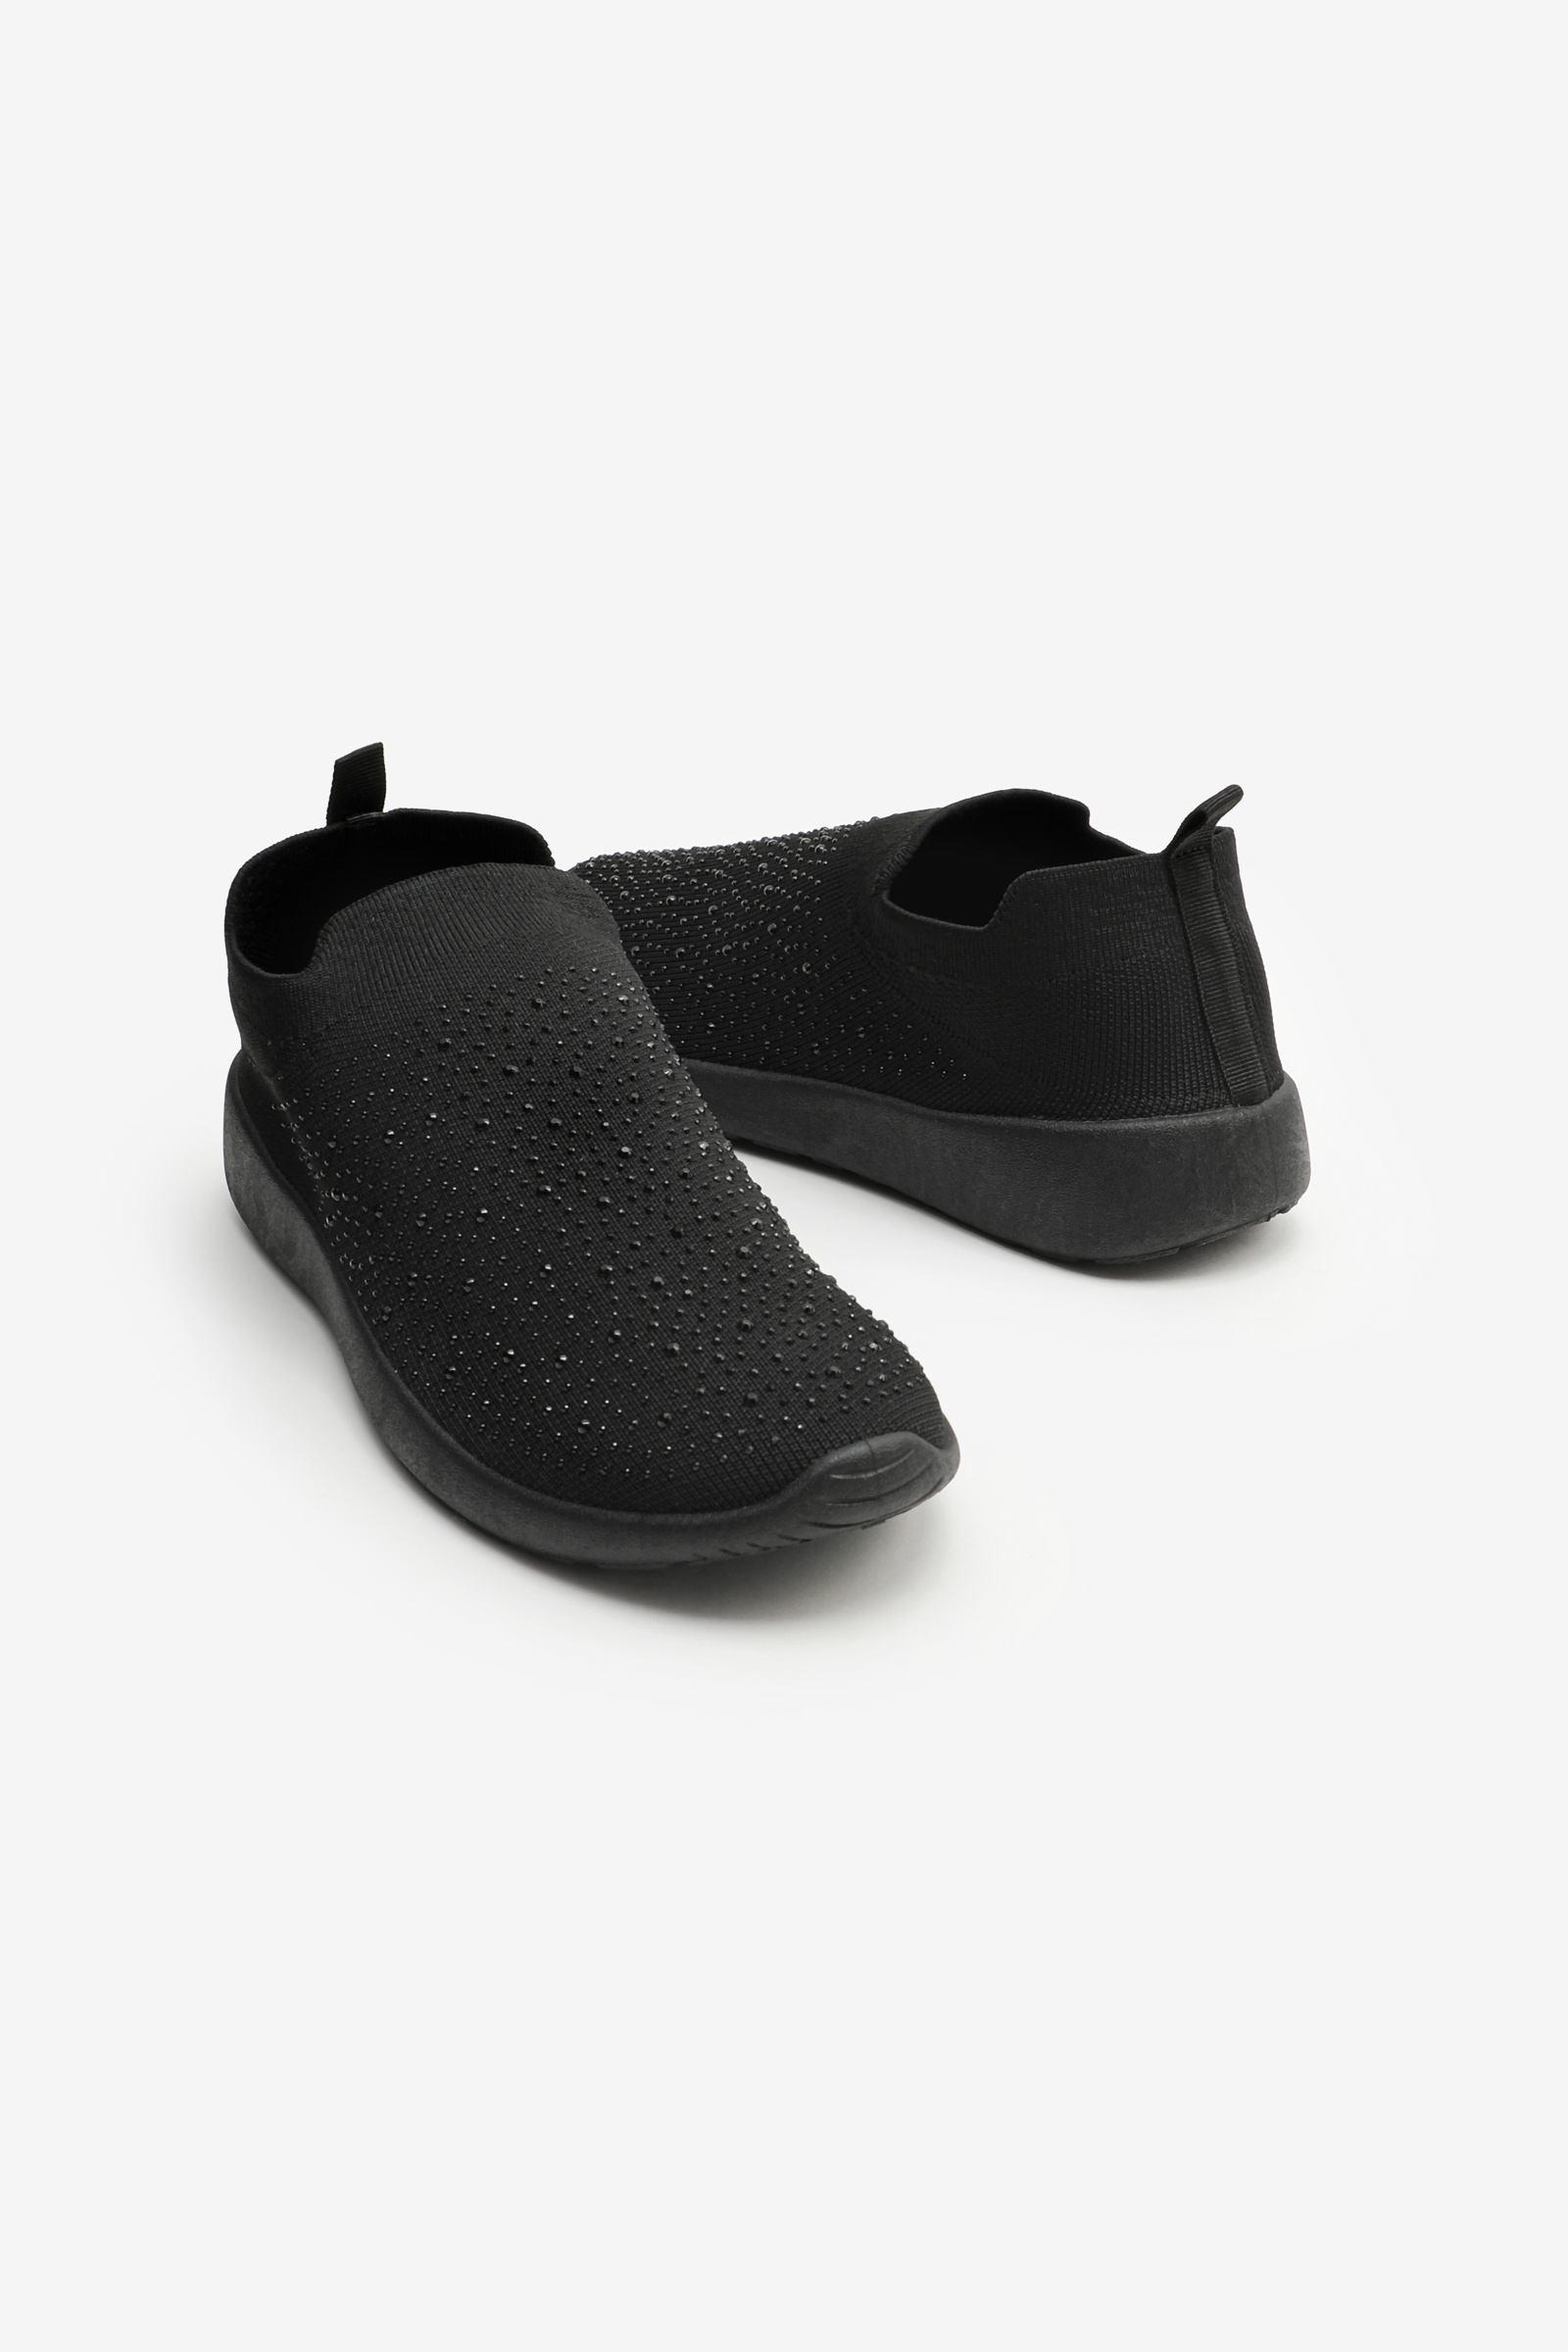 Slip-On Gemstone Running Shoes